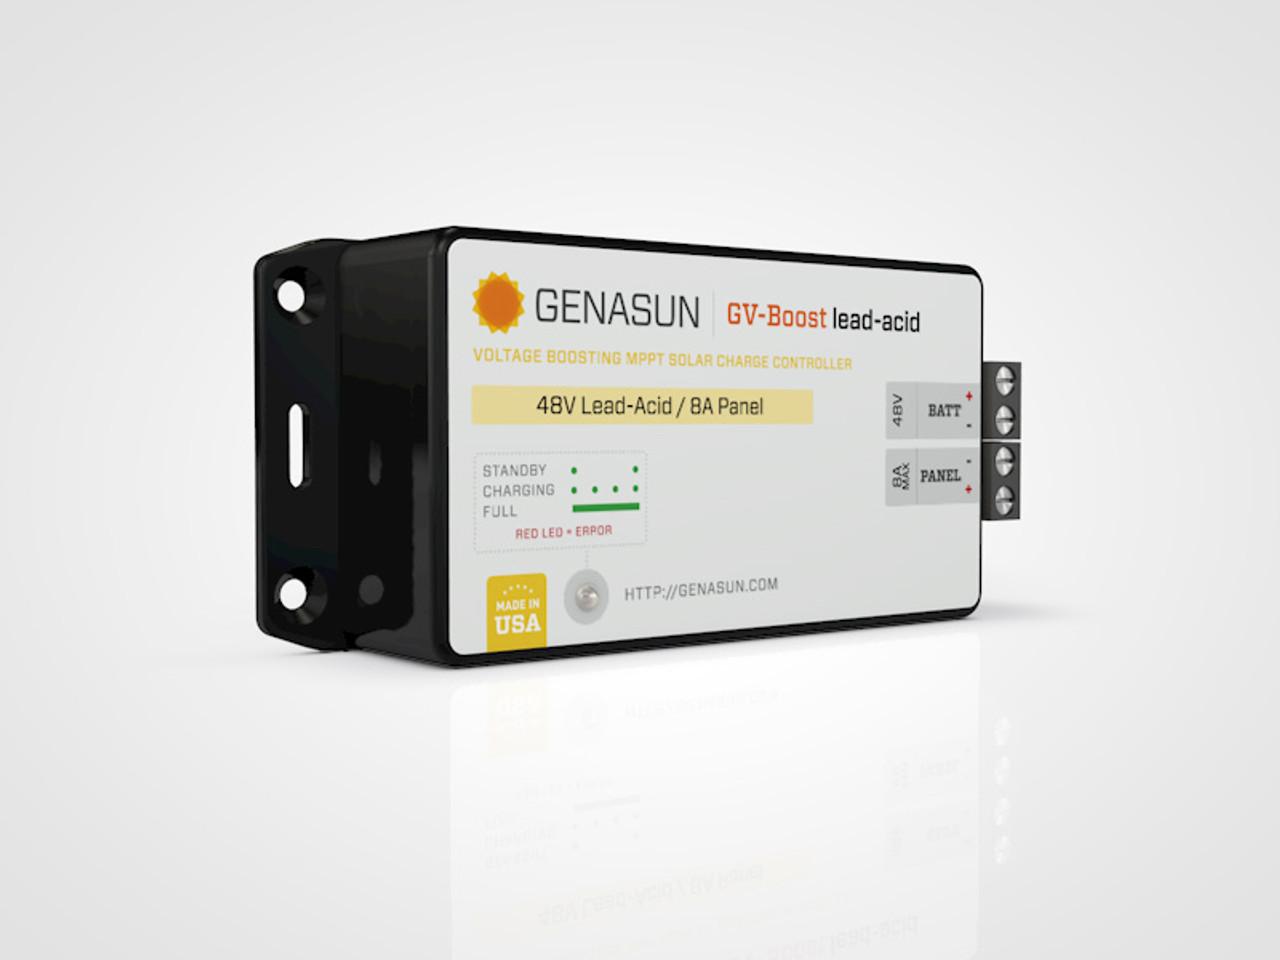 GVB-8 | 210W 8A 24V Genasun MPPT Boost Solar Charge Controller - Pb - Left2